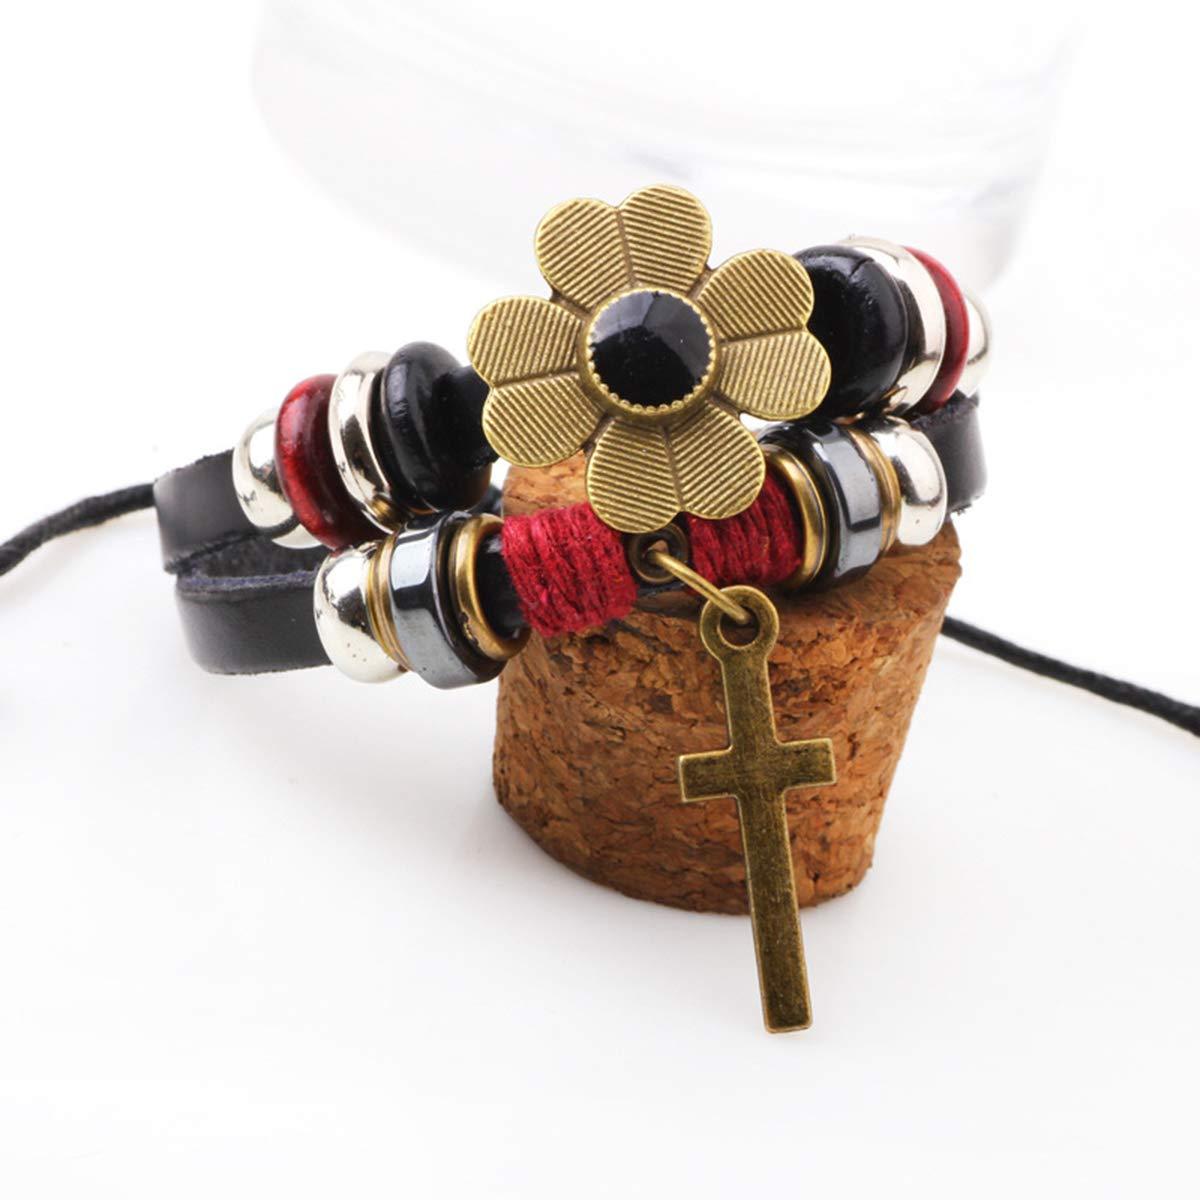 Helloriver Fashion Beaded Leather Rope Ladies Bracelet Vintage Flower Cross Multi-Layered Jewelry